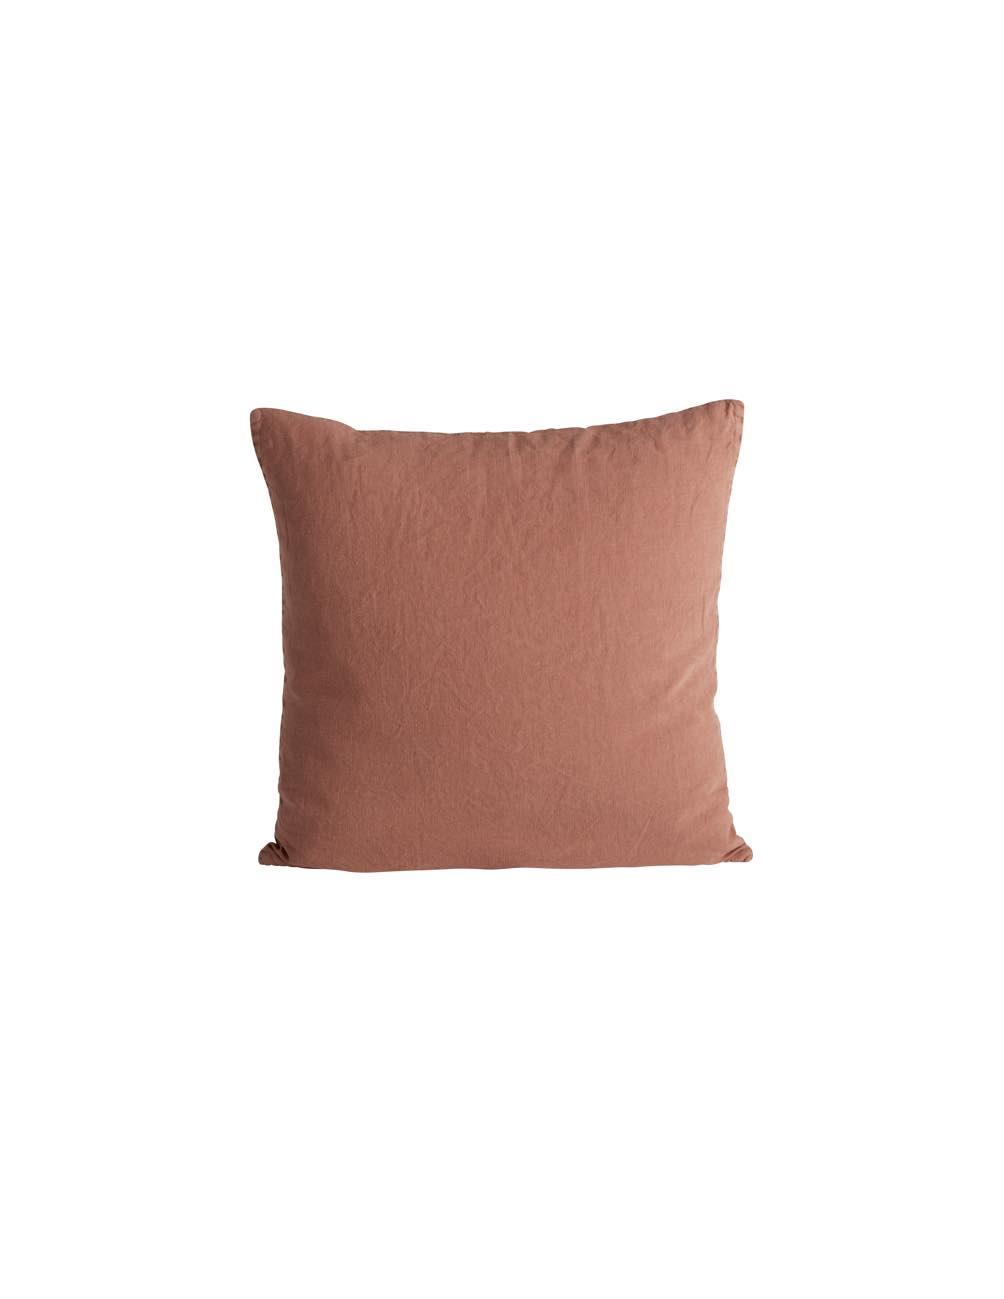 Rust Linen Cushion cover 50x50cm